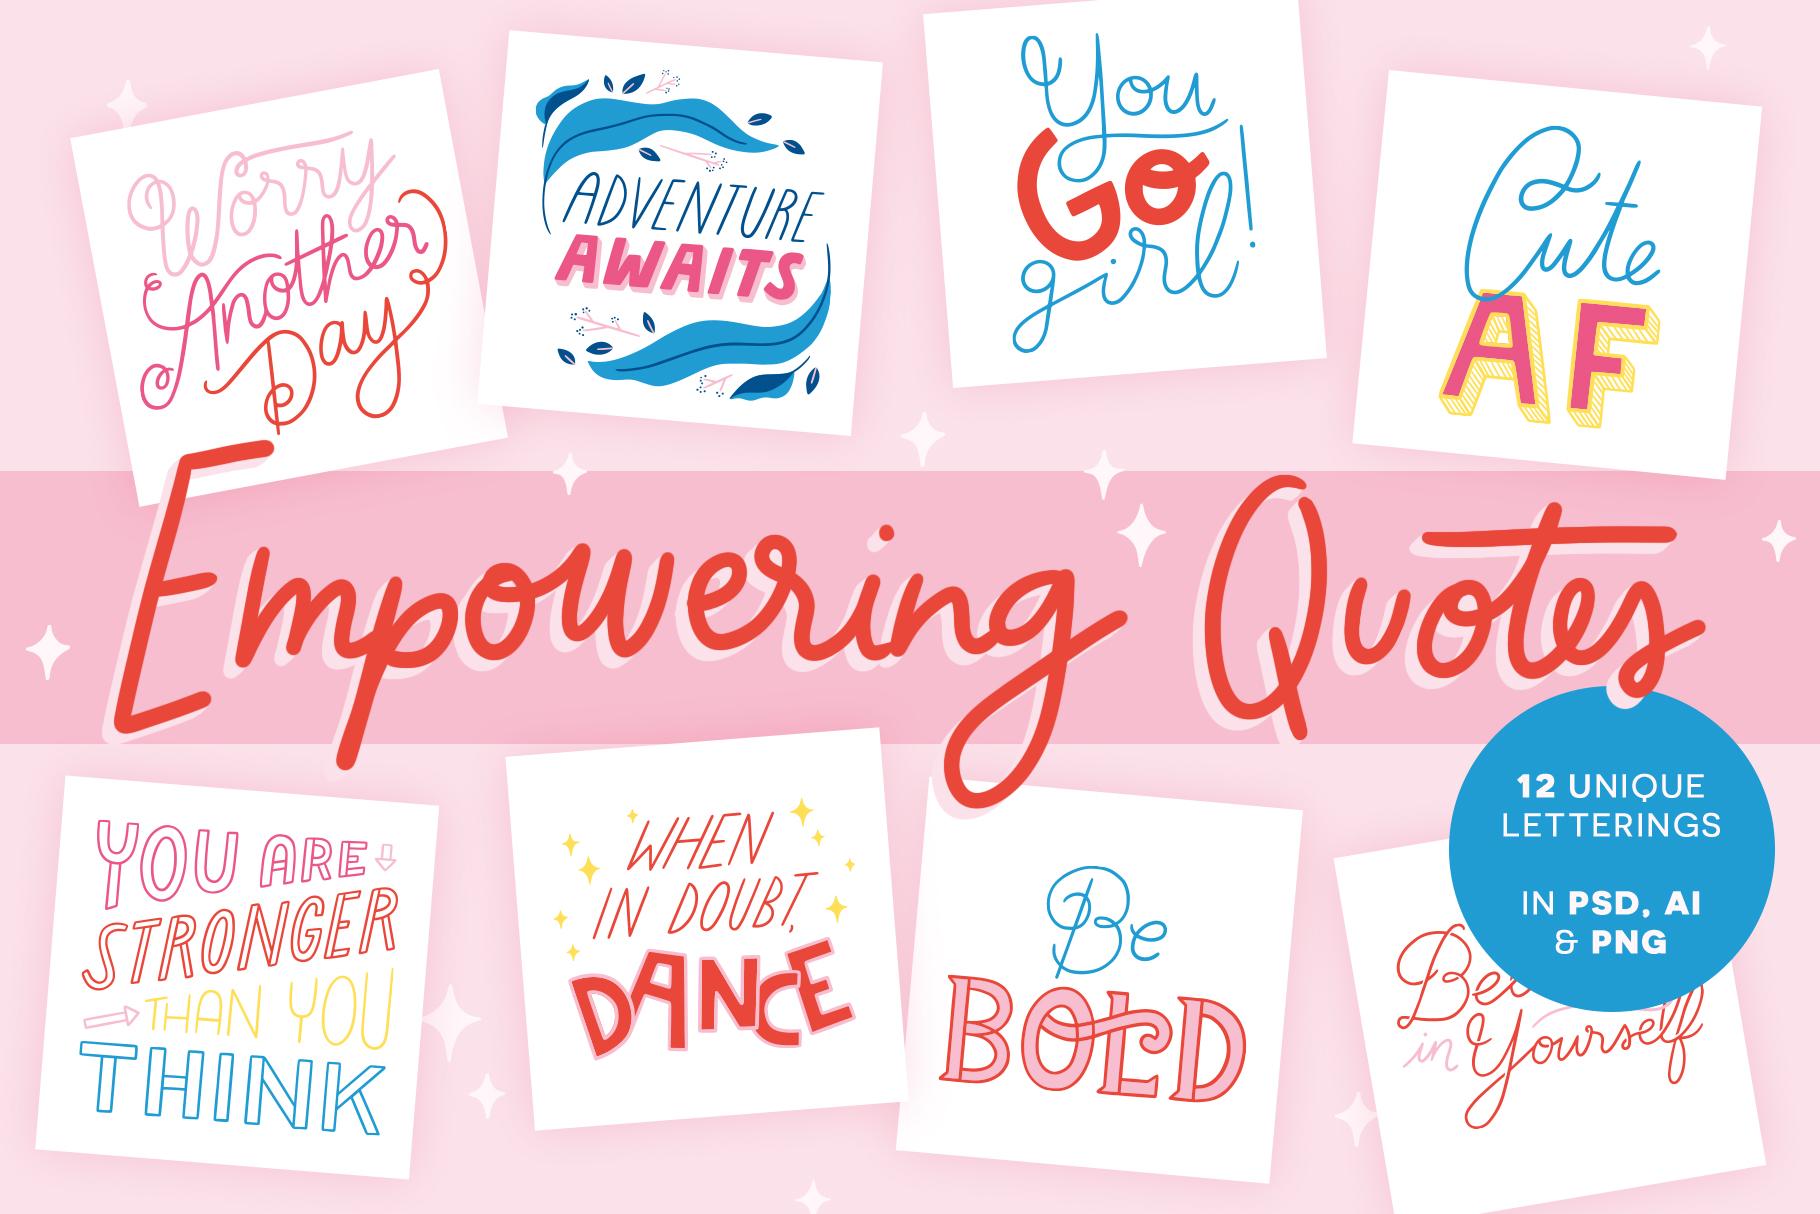 Empowering-Quotes-1.jpg